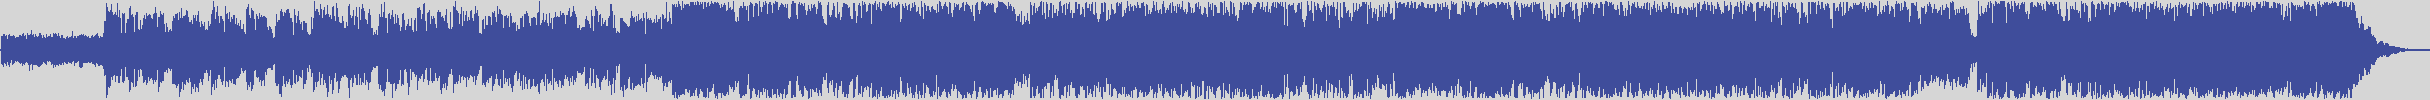 gold_hit_records [GHR003] Lucas Castro - Lo Sai [Radio Edit] audio wave form